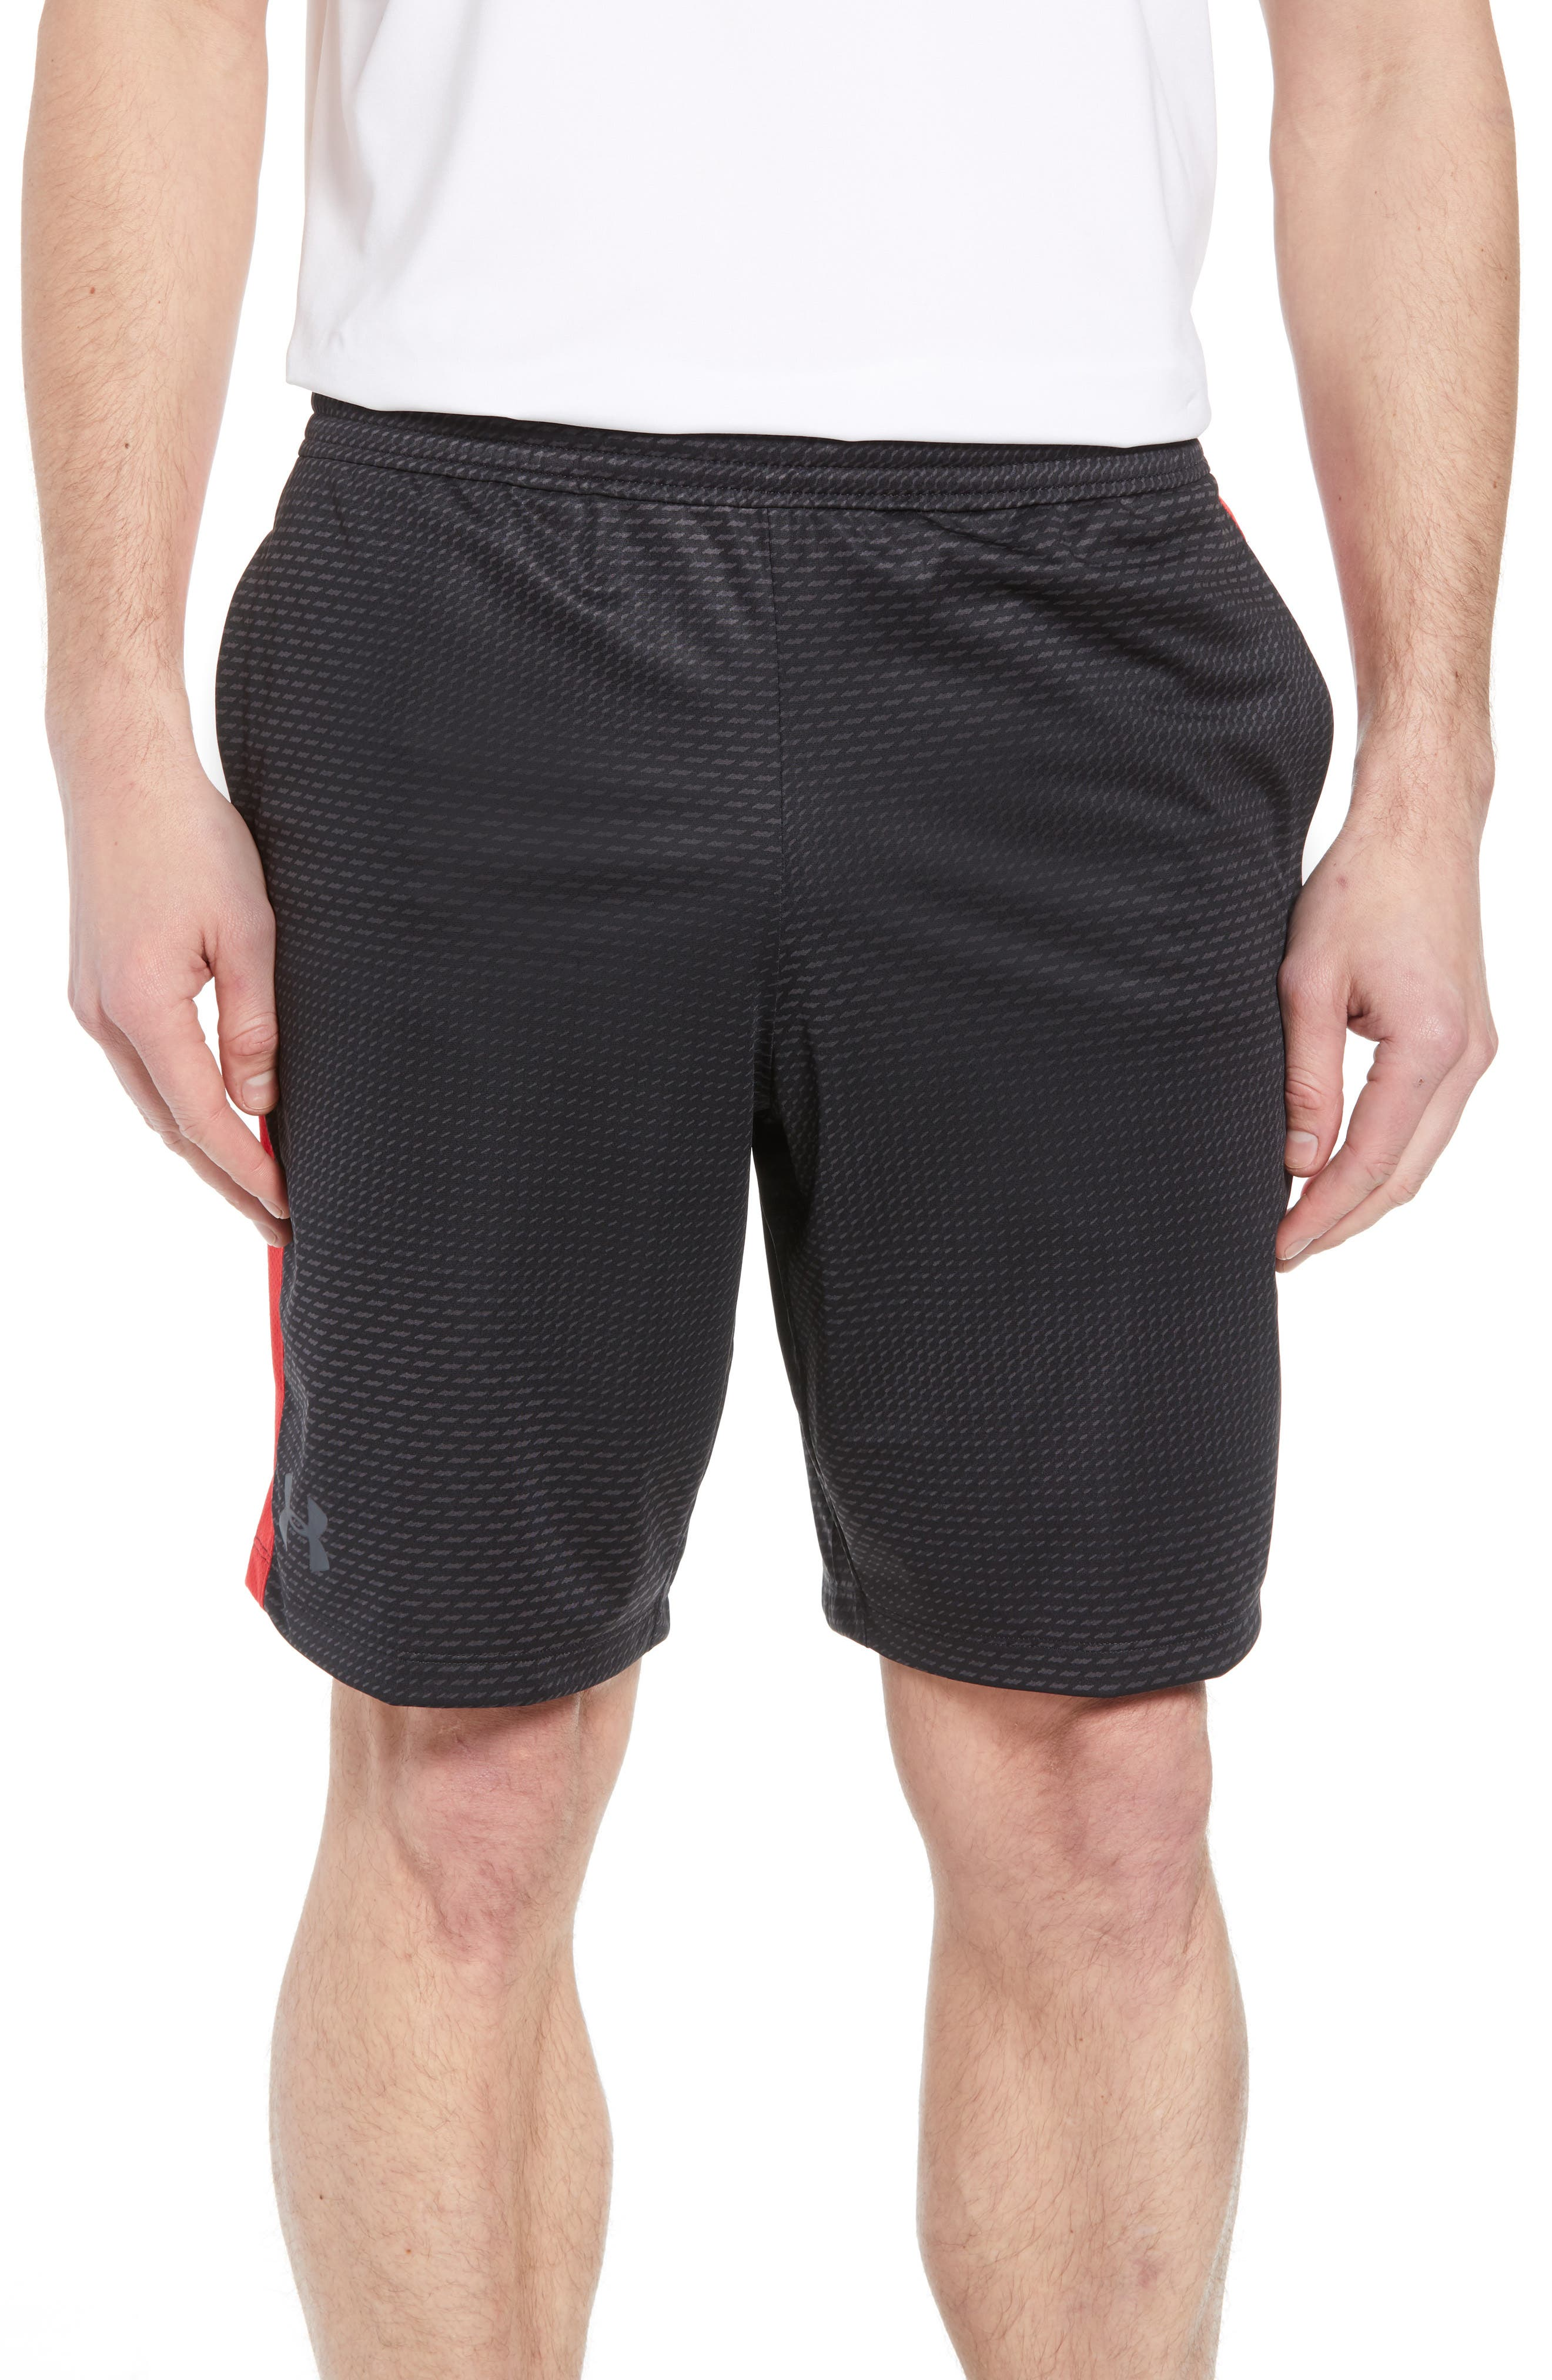 UNDER ARMOUR Raid 2.0 Classic Fit Shorts, Main, color, 001